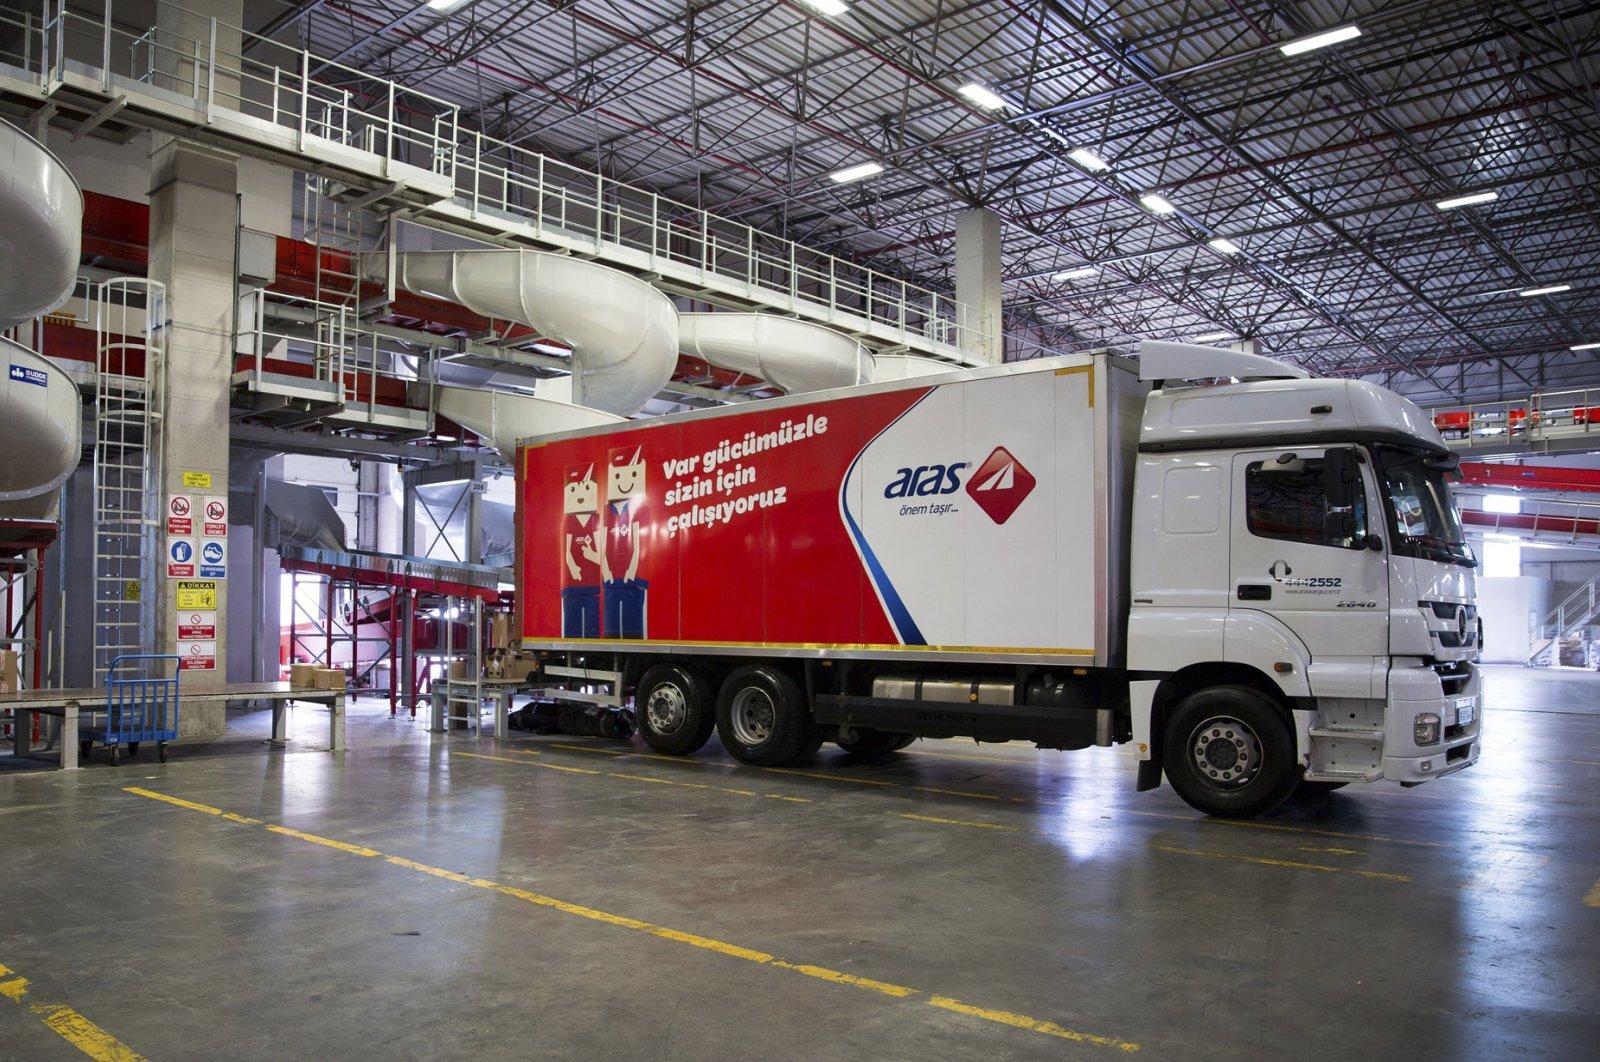 An Aras Kargo truck is seen at the company's Ikiteli Transfer Center in Istanbul's Başakşehir district, Turkey, Nov. 24, 2017. (File Photo)